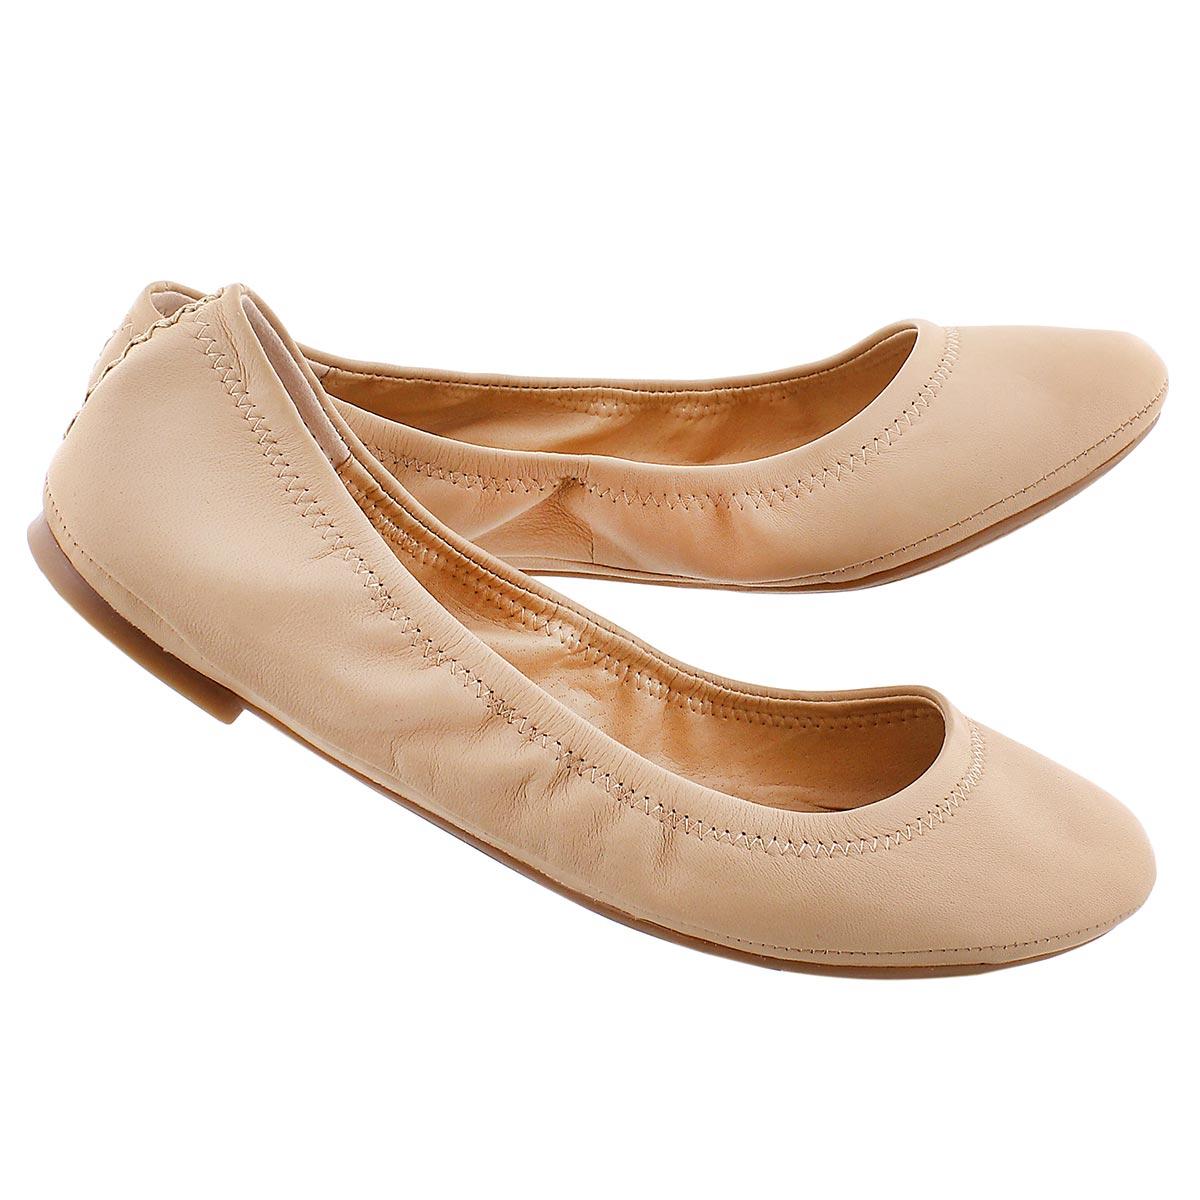 Lds Emmie nude ballerina flat